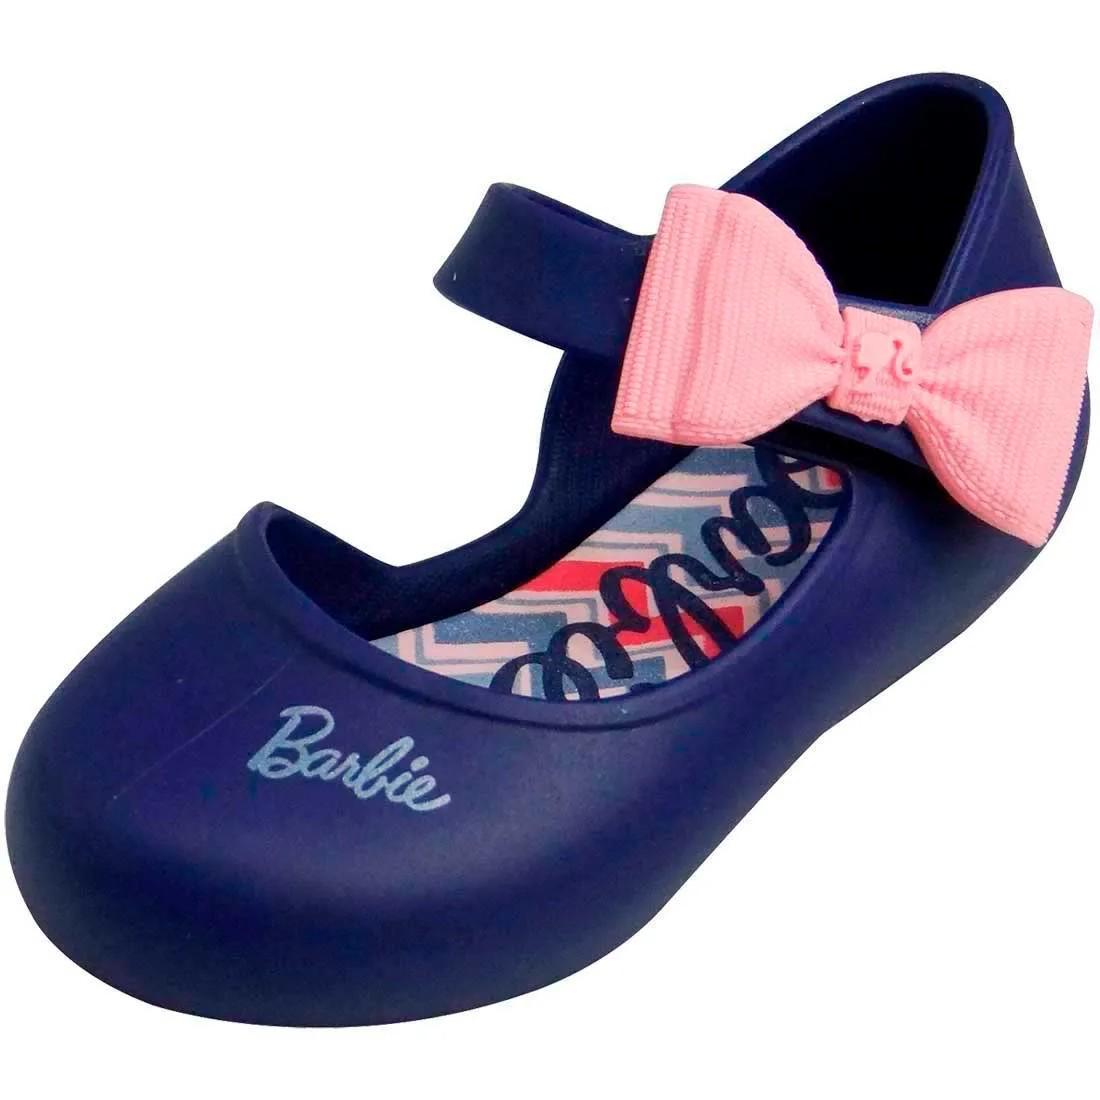 Sapatilha Baby Barbie Happy - Azul Marinho